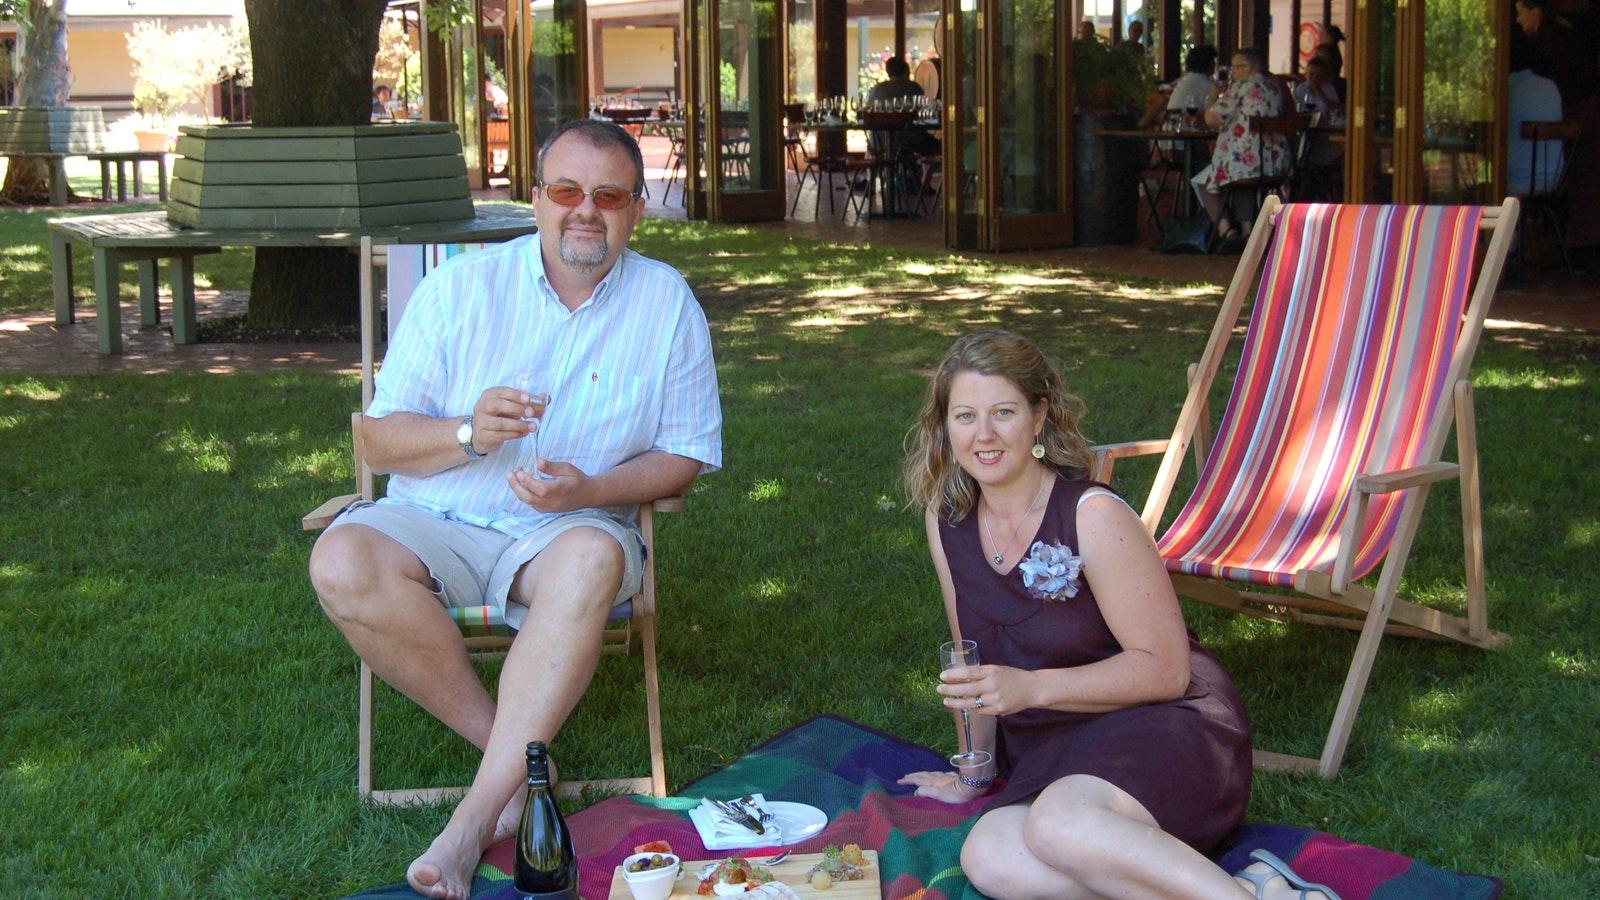 Italian Delights' owners - Jim and Lynette Romagnesi